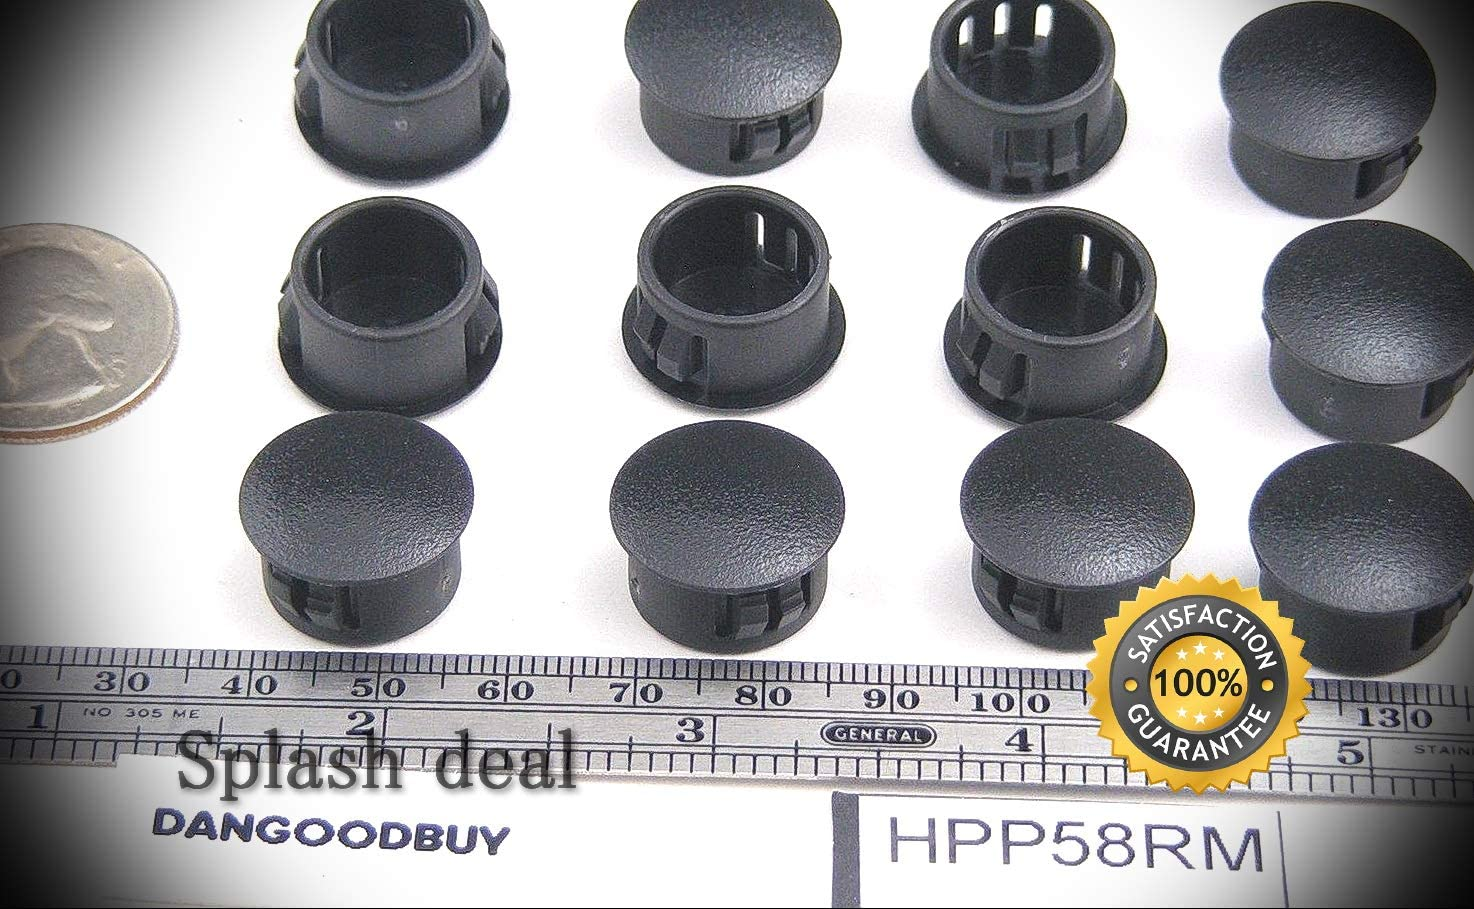 12 Max 67% OFF Locking Rigid Plastic Hole Plugs - Opening Blac 8